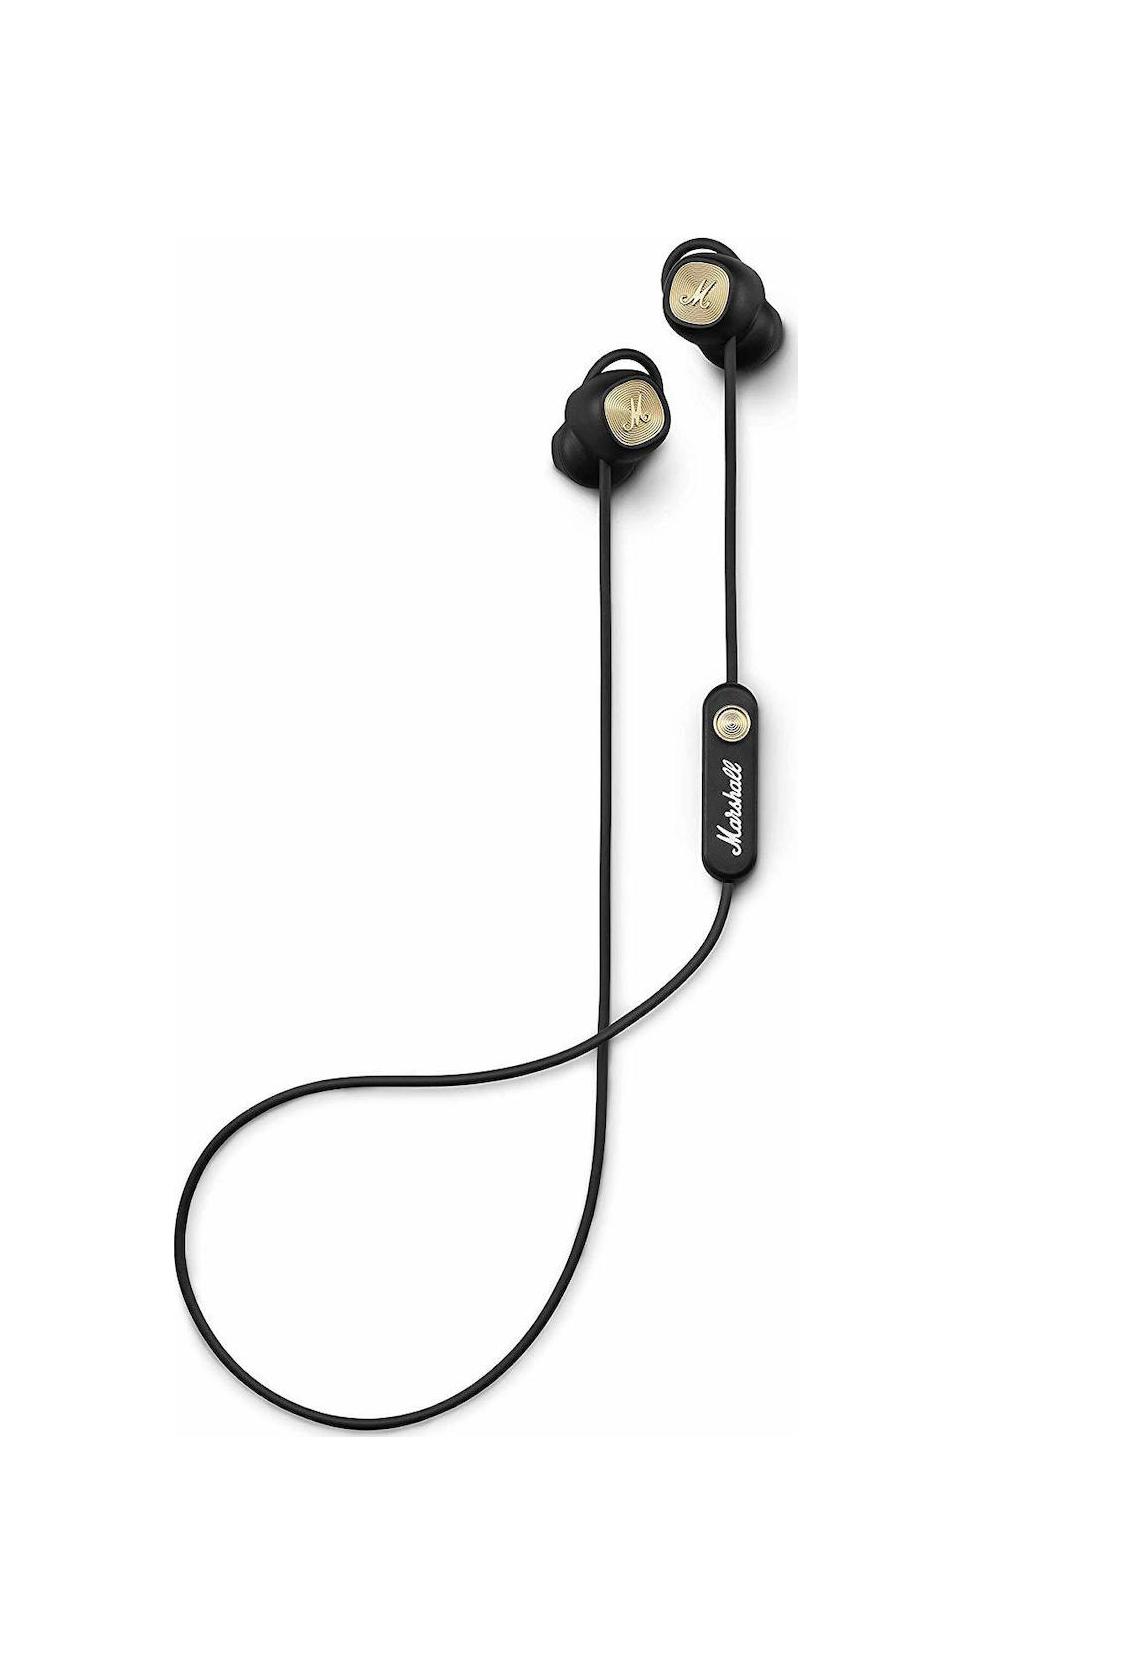 Marshall Minor II Bluetooth Ακουστικά Handsfree Black